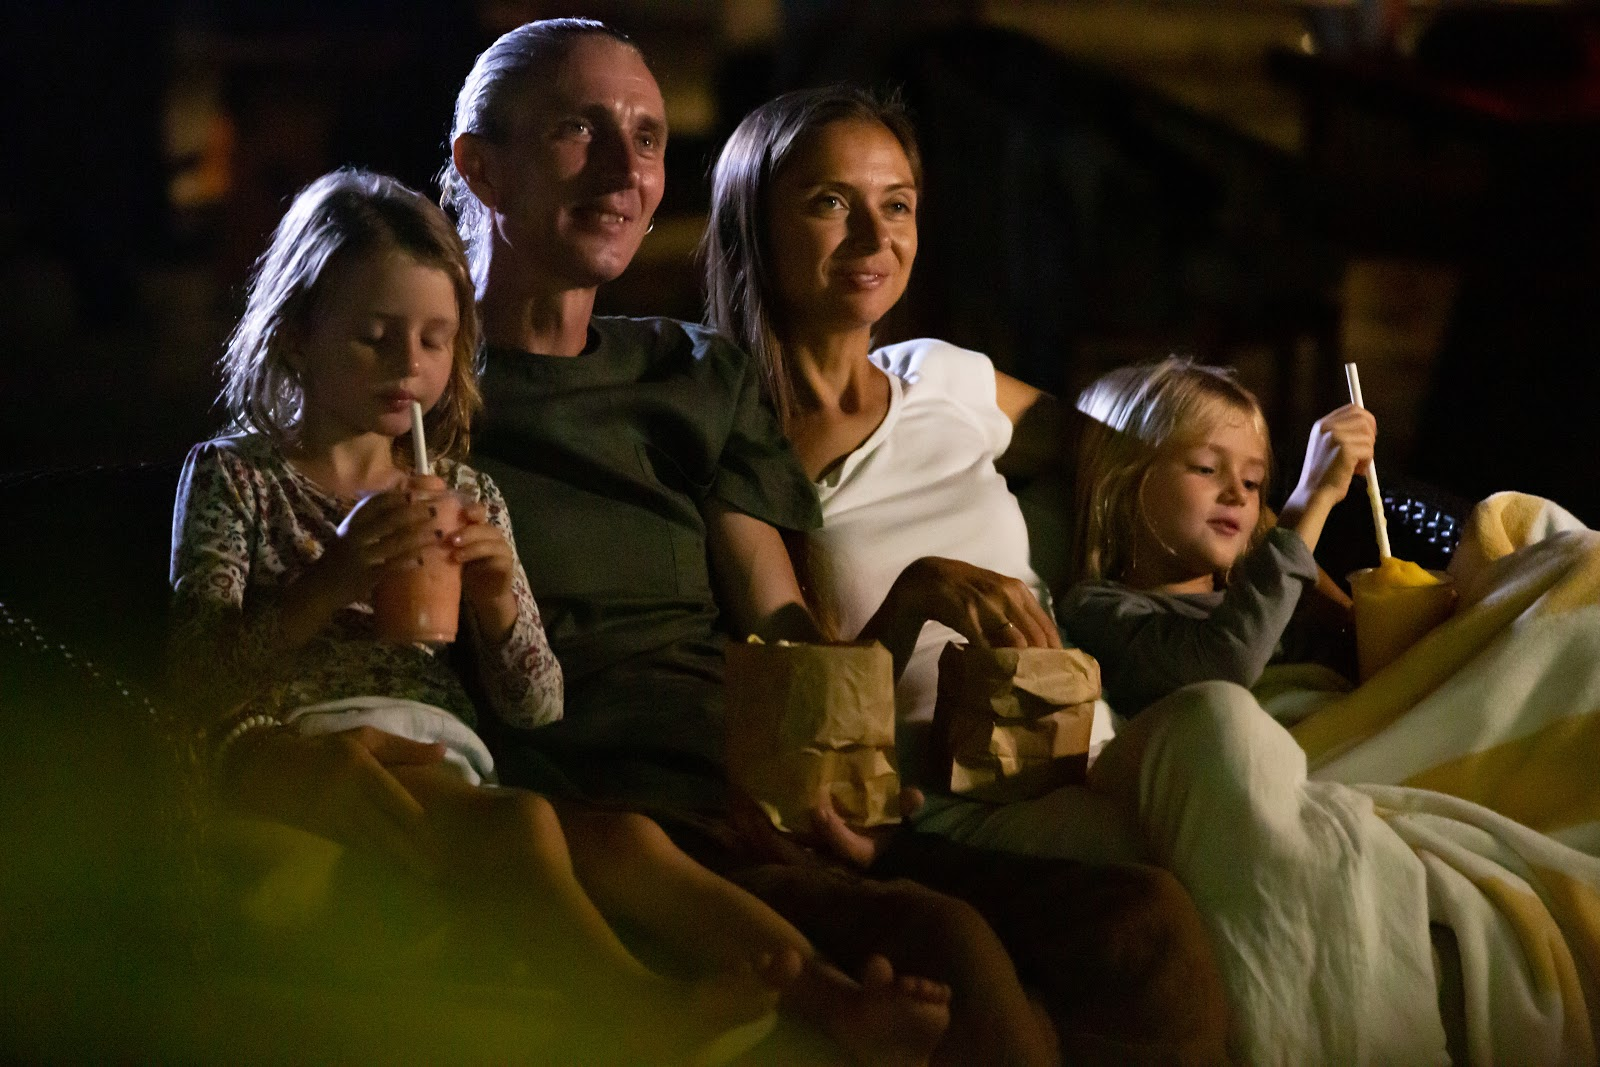 Family having an outdoor movie night